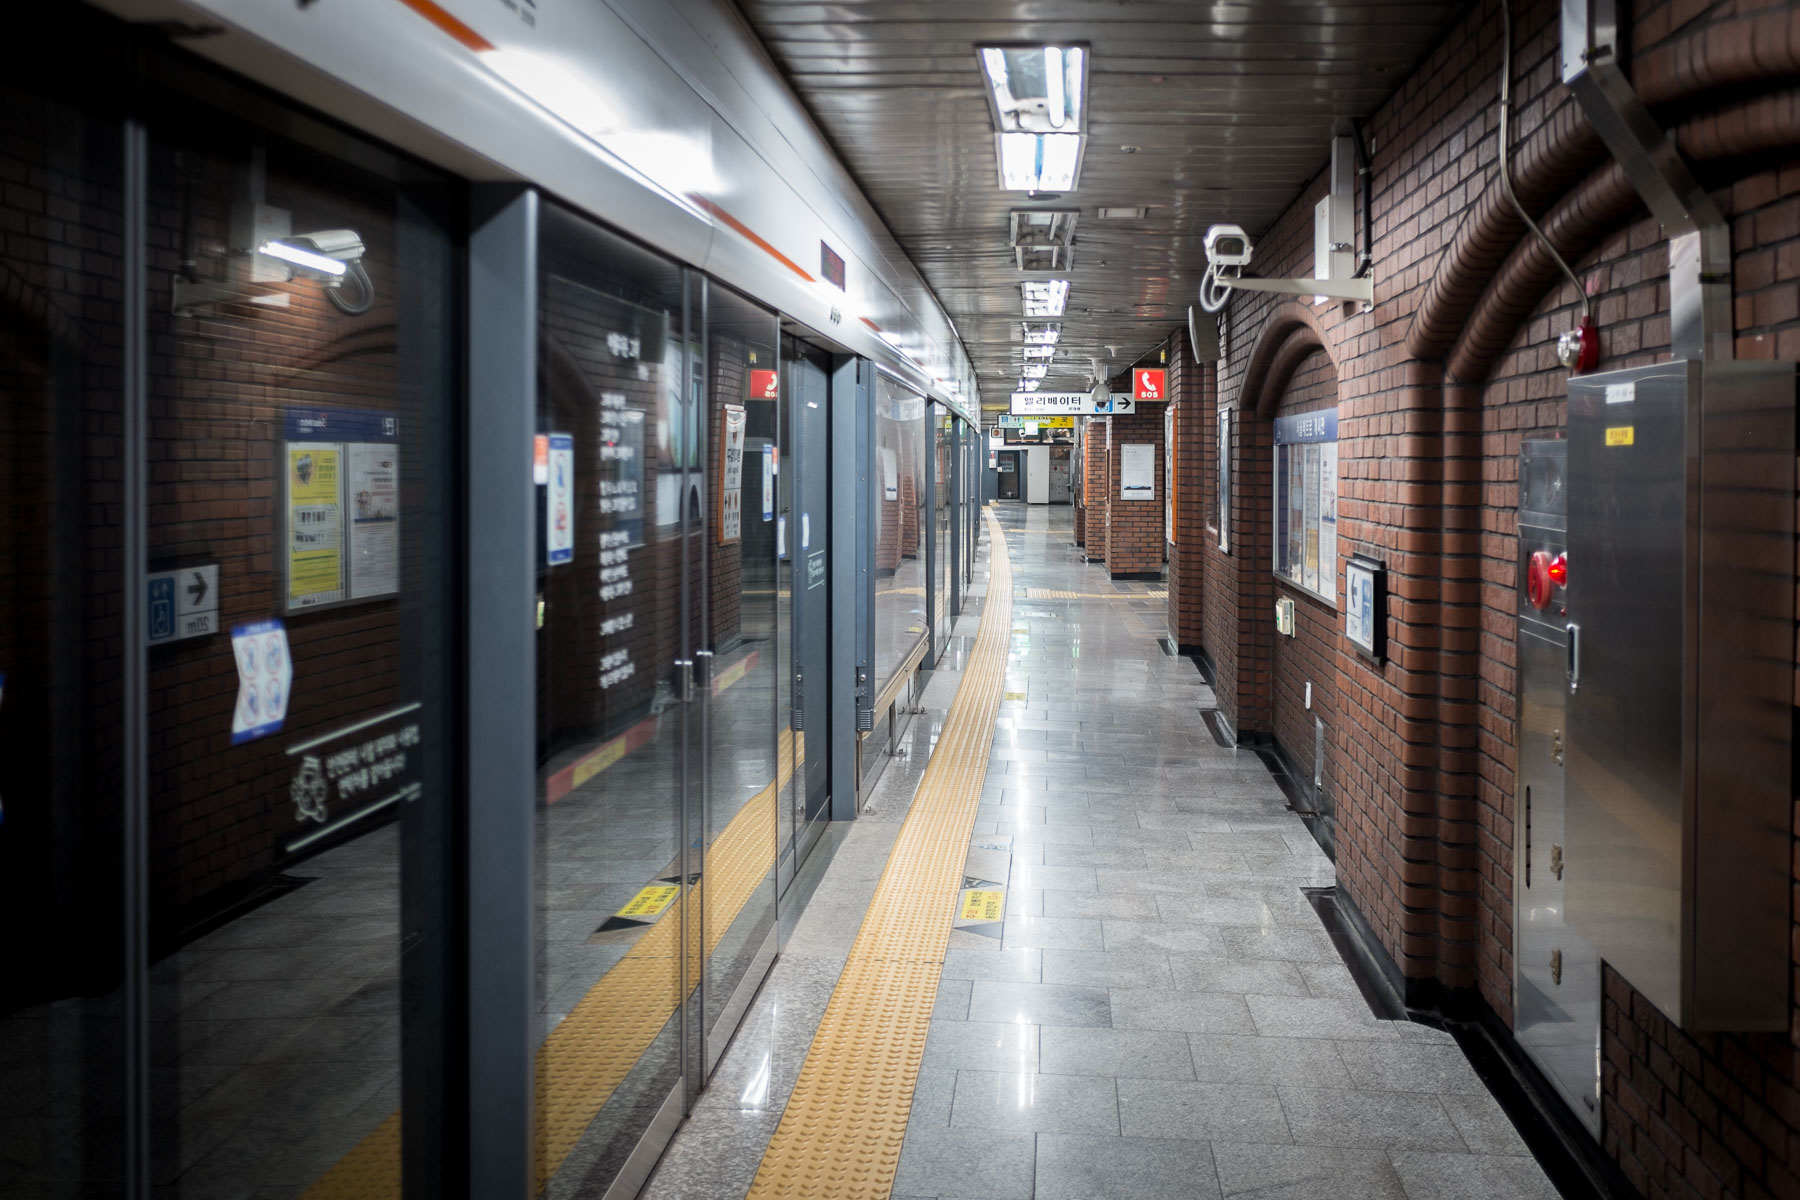 Seoul Fall 2015 (29 of 32)